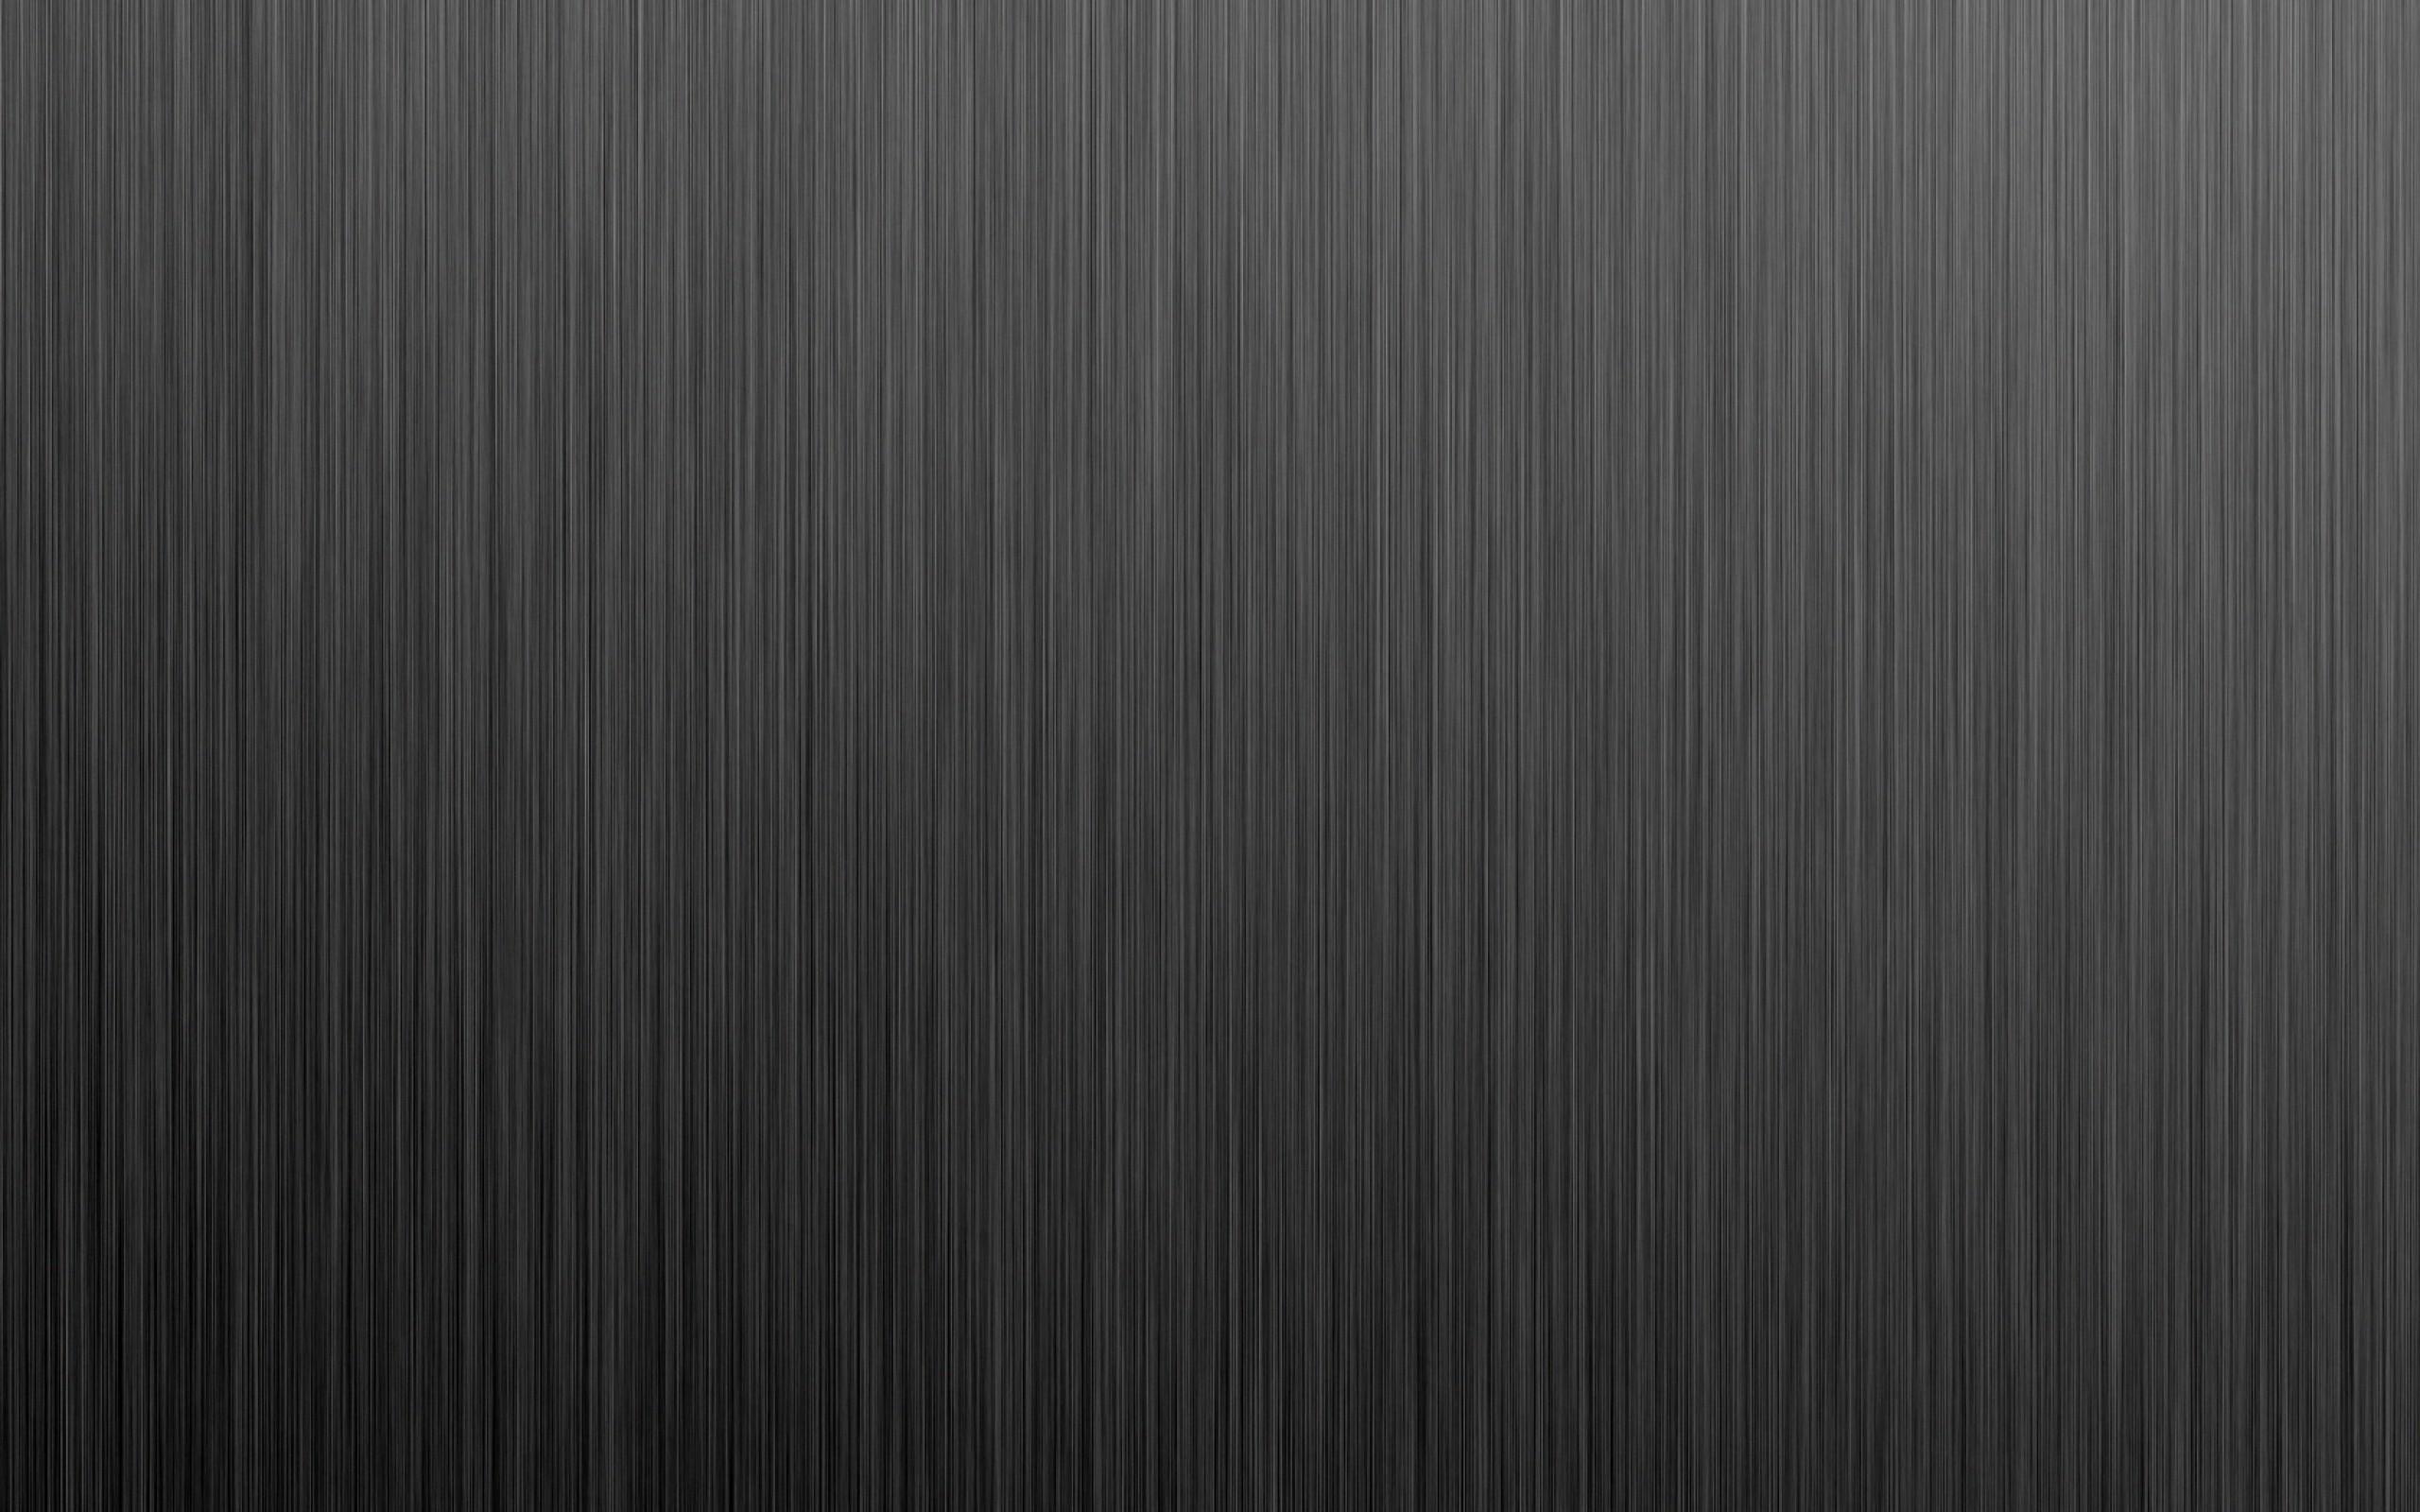 Black Silver Hd Wallpaper 68 Images